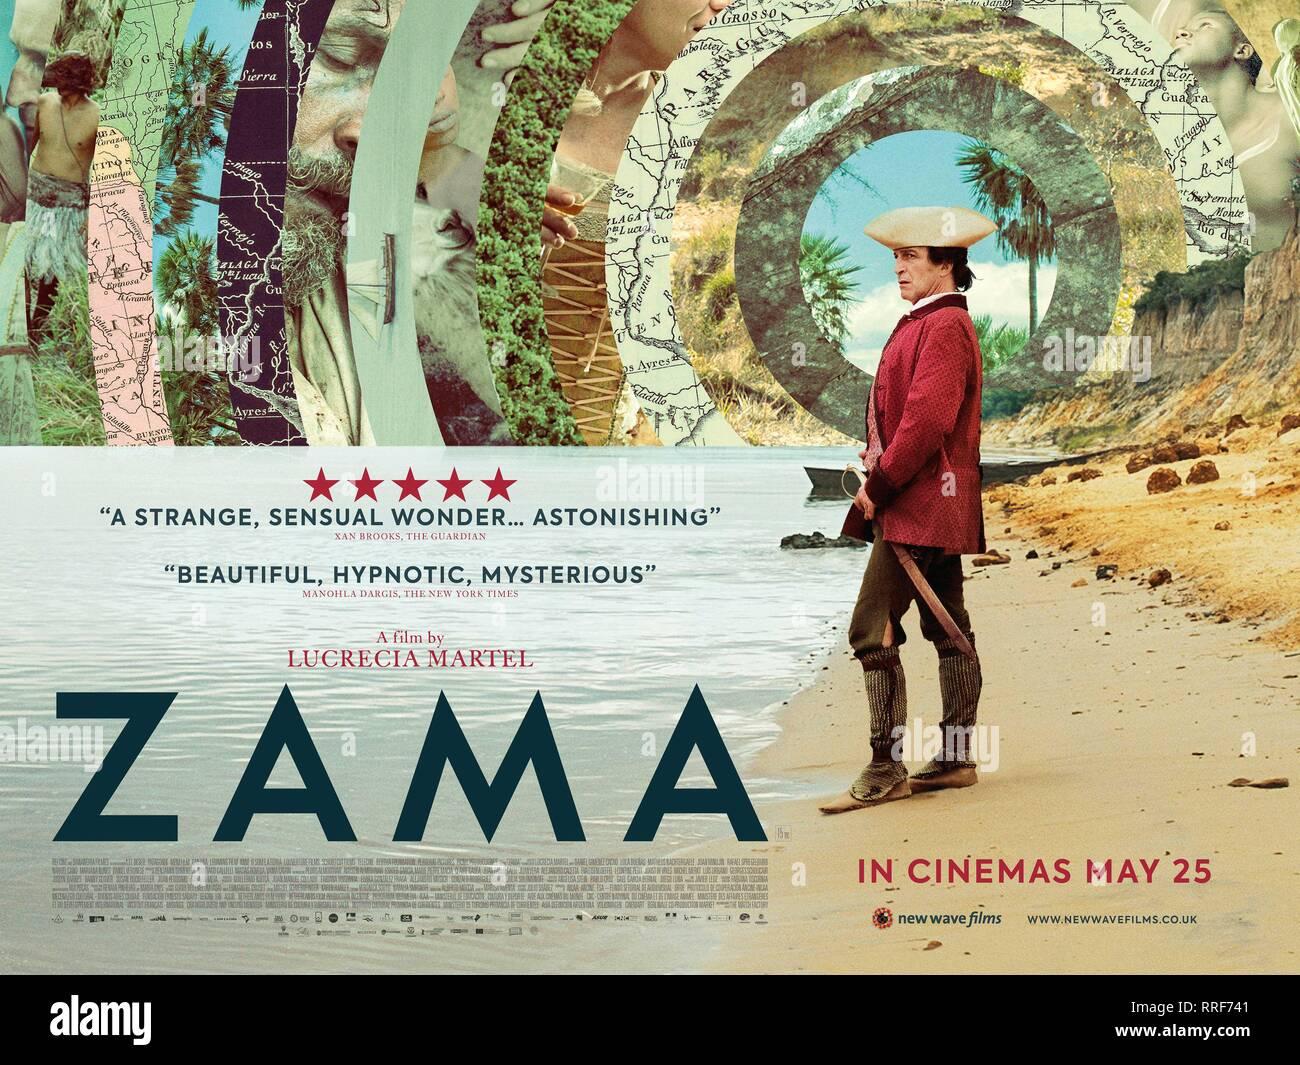 ZAMA, MOVIE POSTER, 2017 - Stock Image